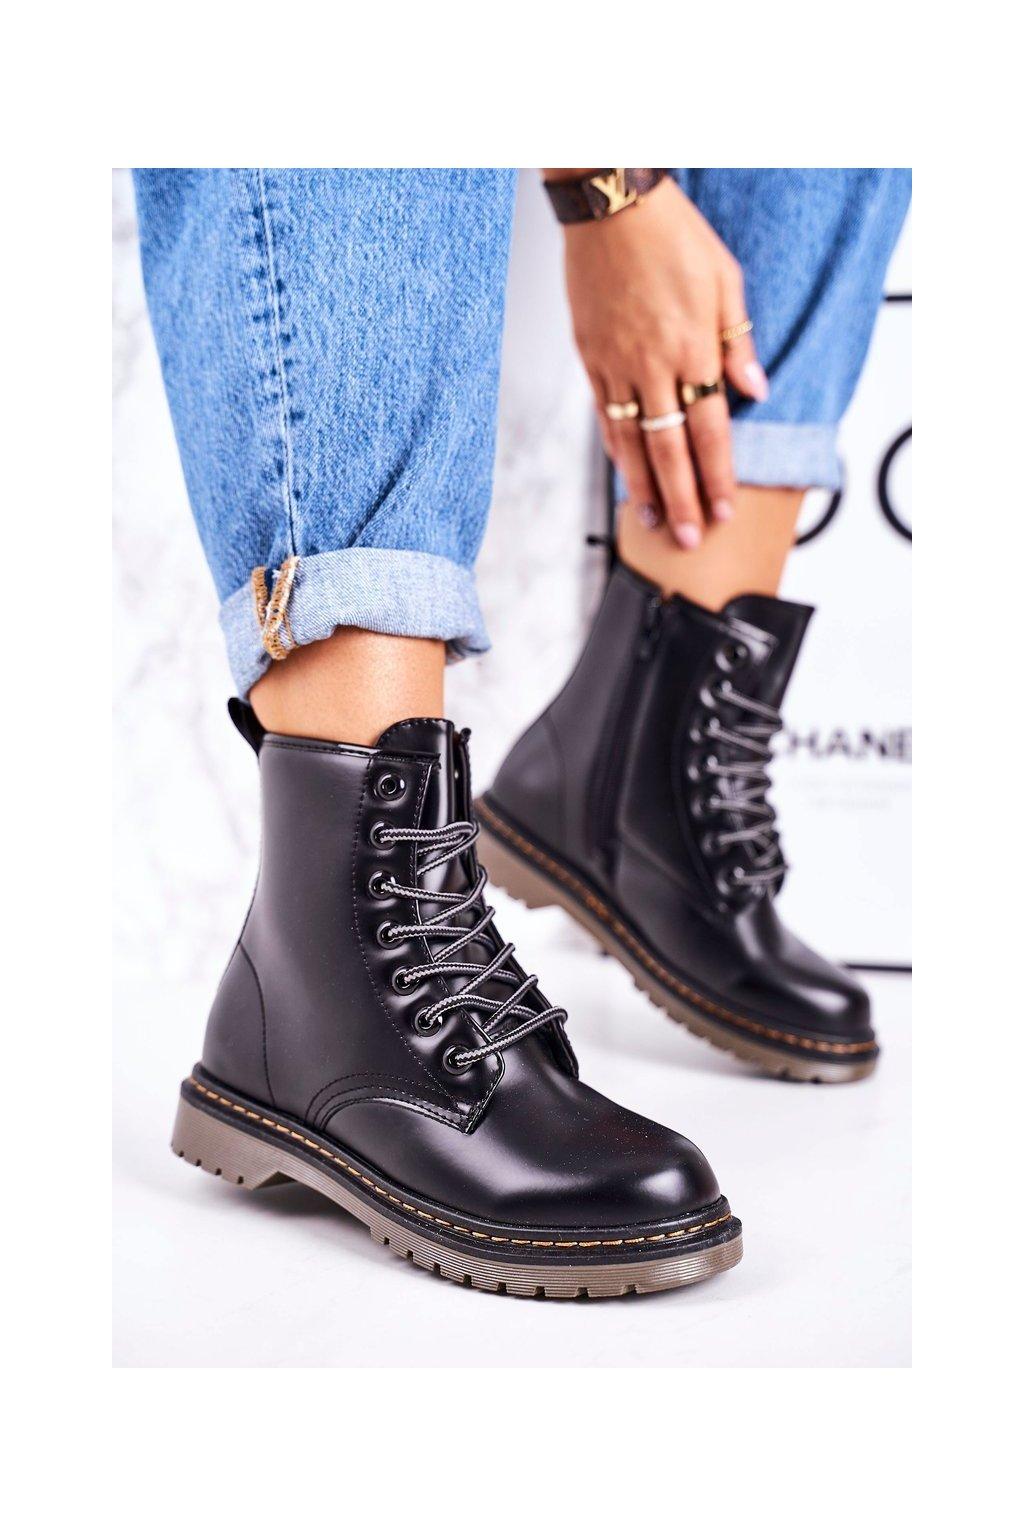 Členkové topánky na podpätku farba čierna kód obuvi TL142-2 BLK MATTE